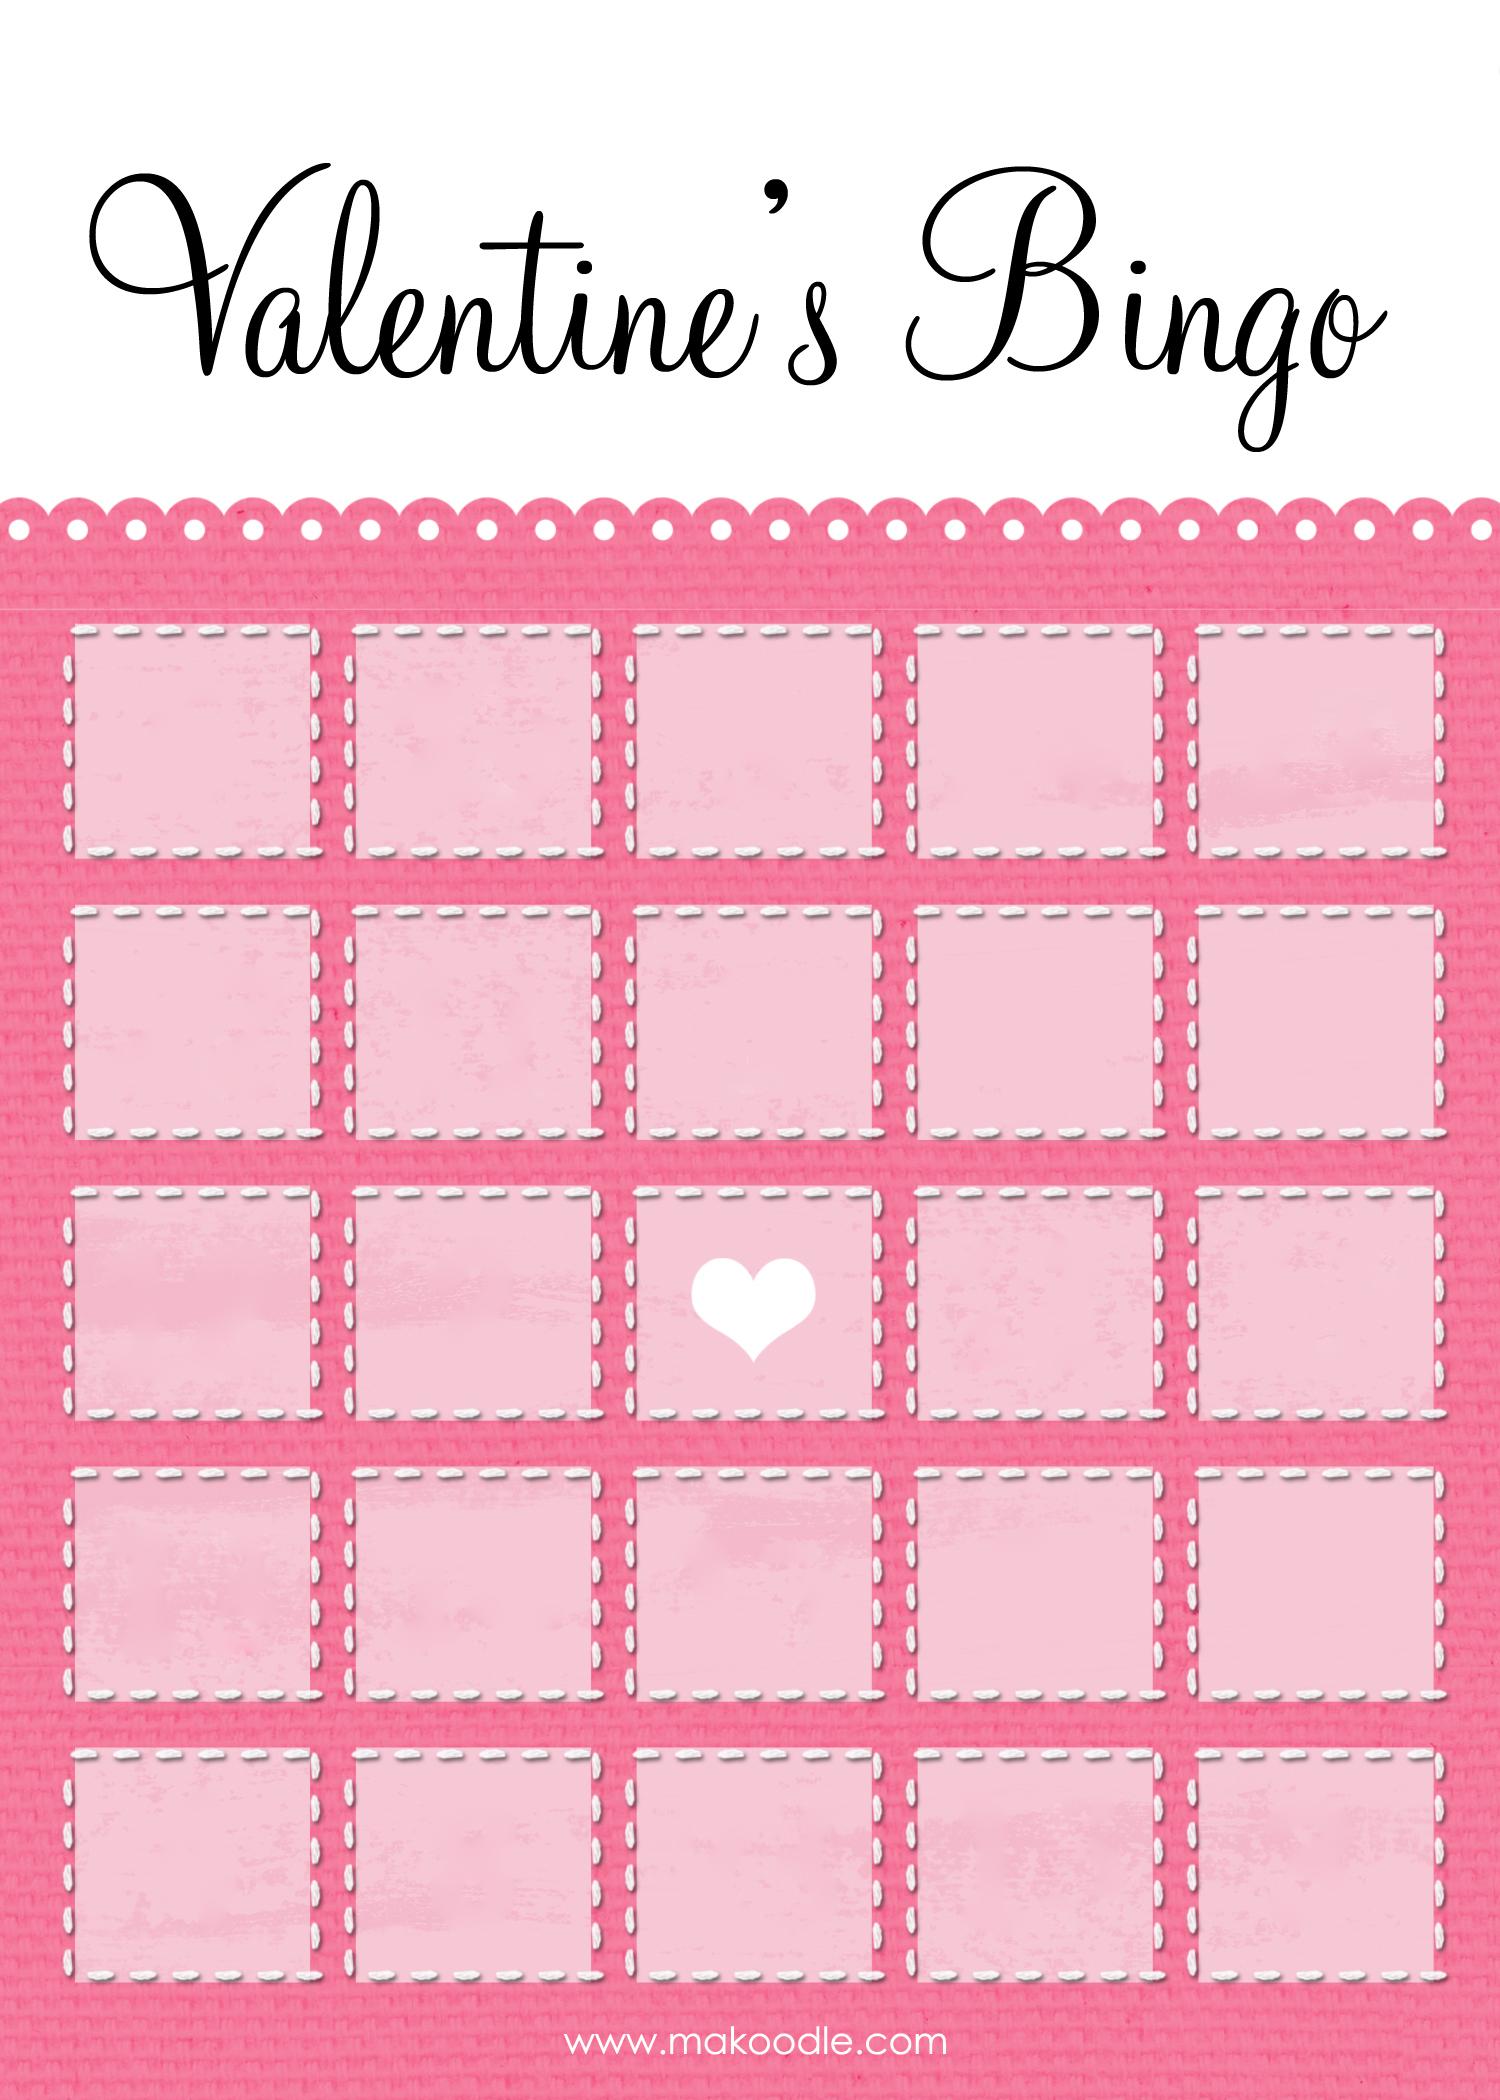 8 Images of Valentine Bingo Free Printable Template